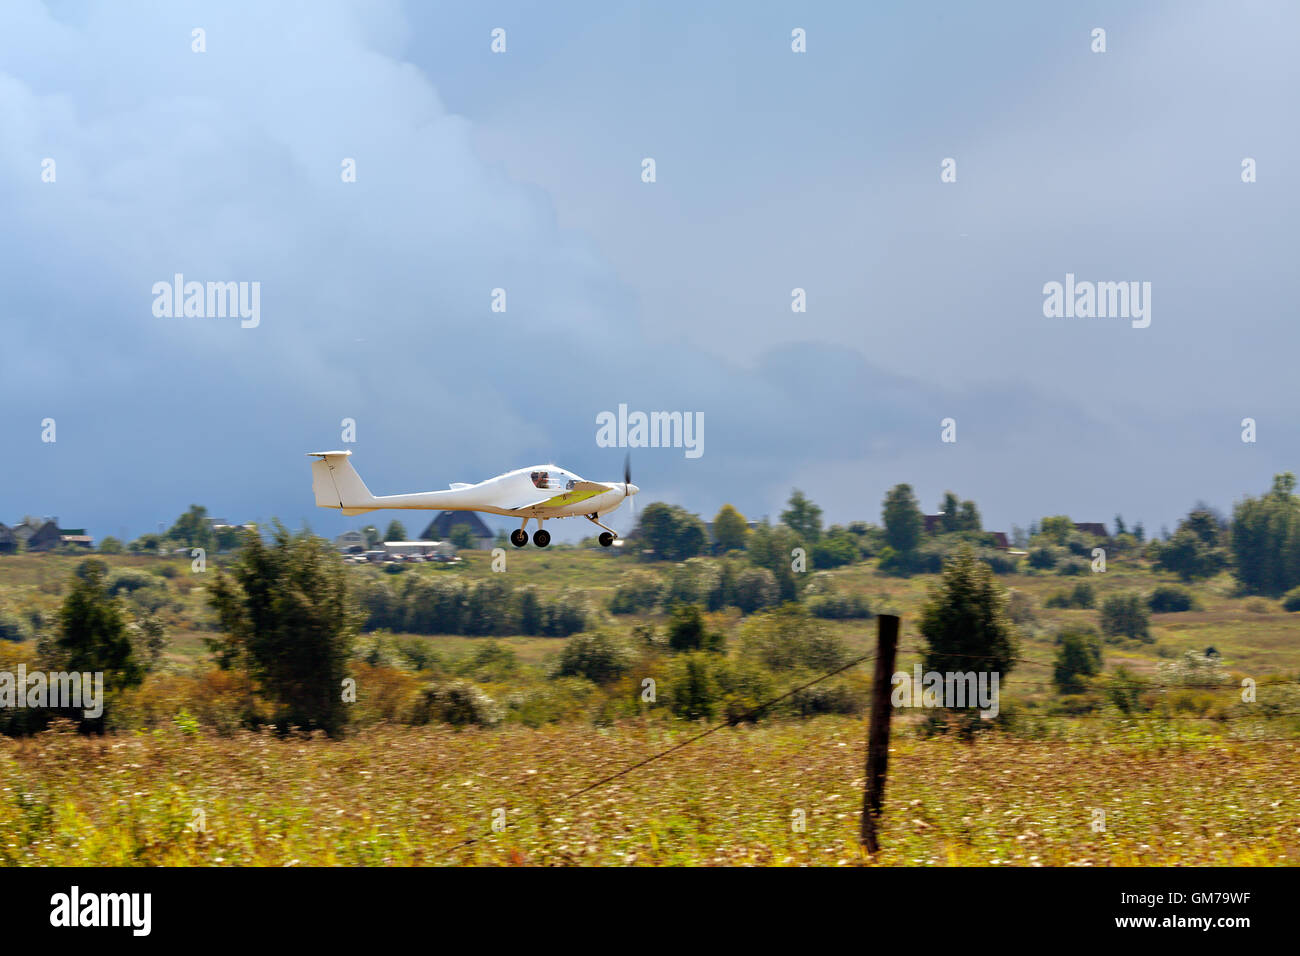 Small plane - Stock Image